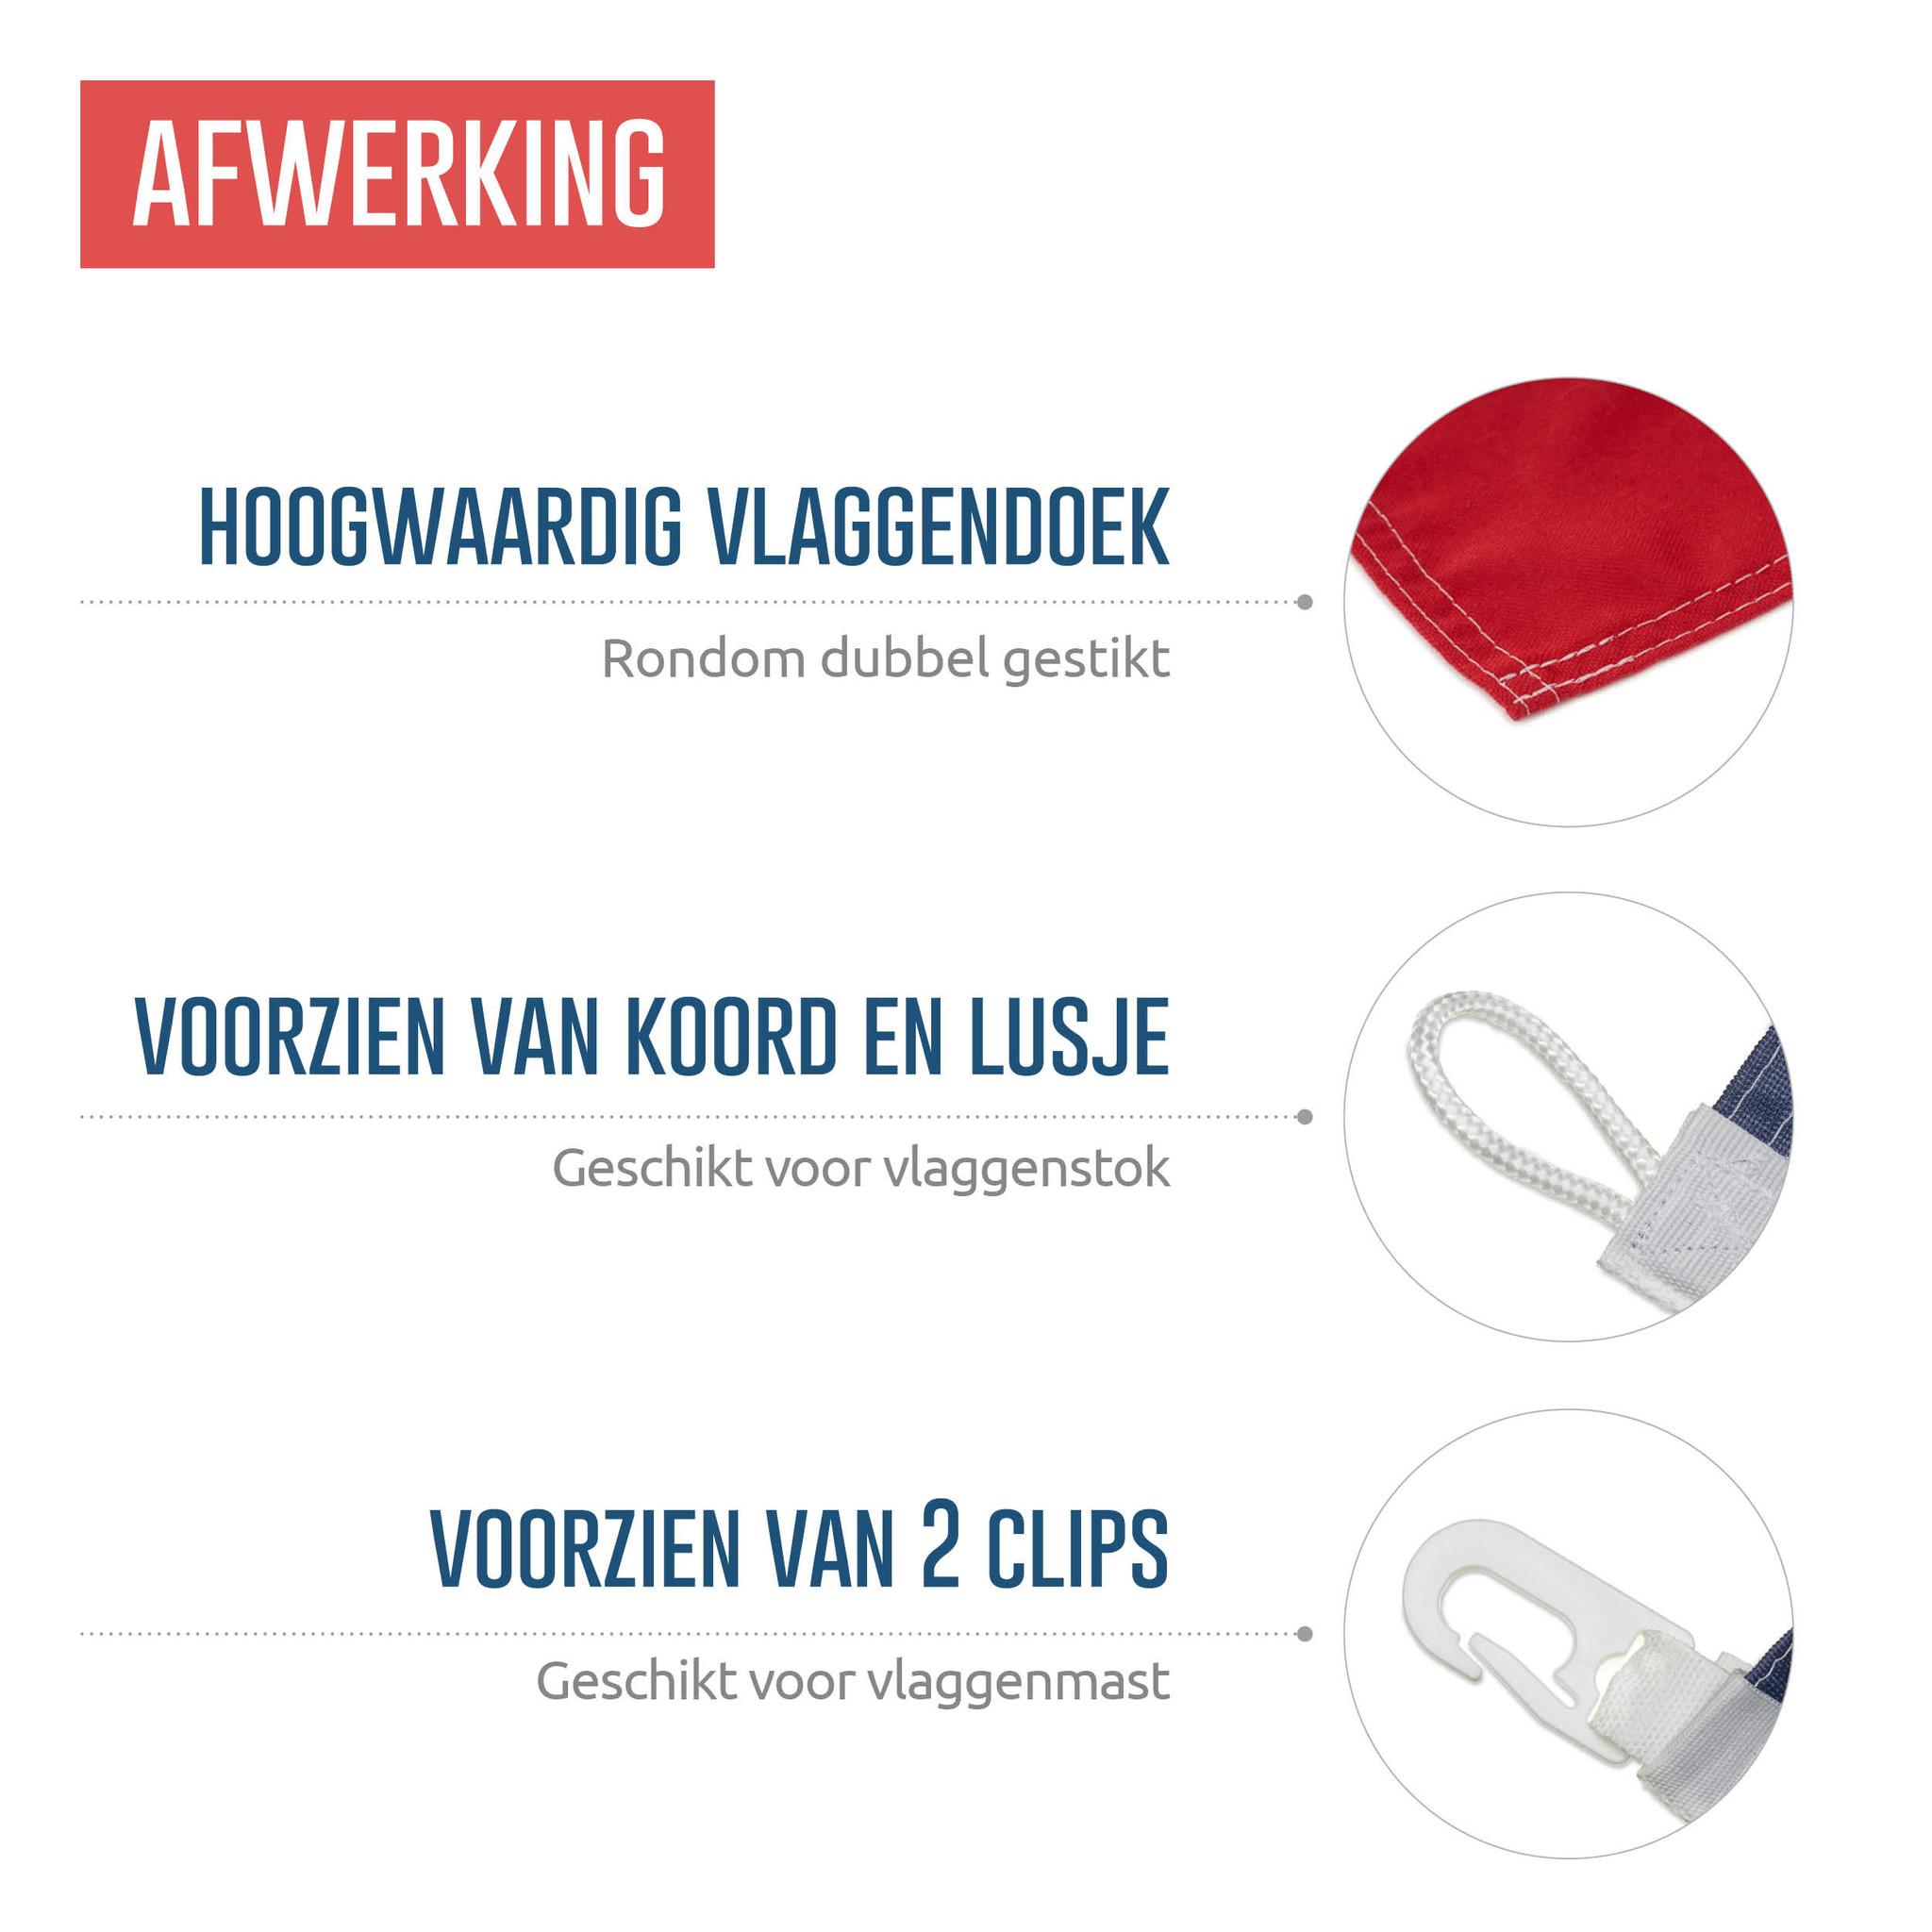 Vlag 's-Hertogenbosch / Den Bosch